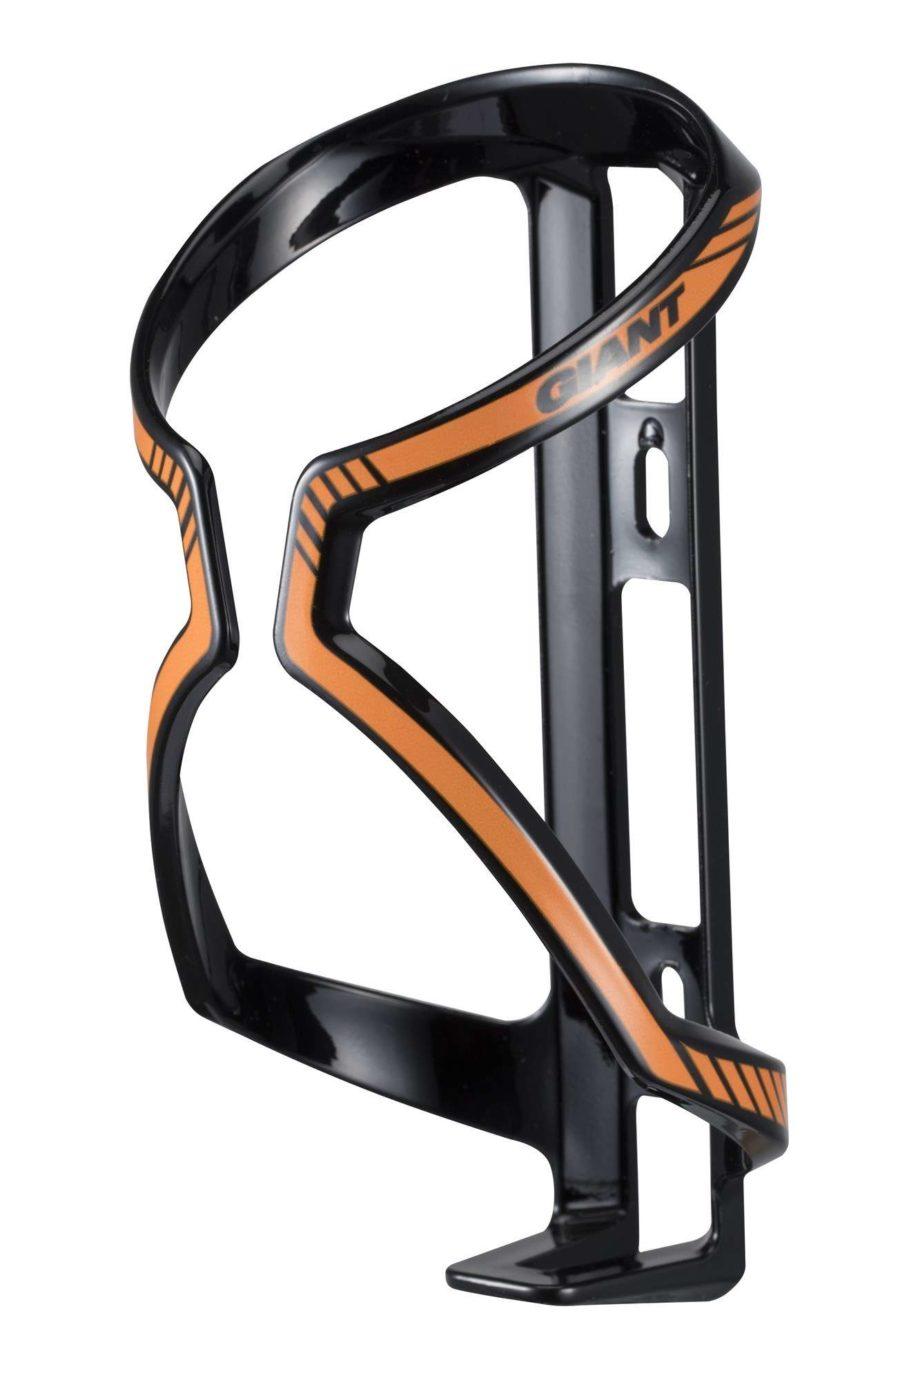 Giant Airway Sport Bottle Cage Black-Orange